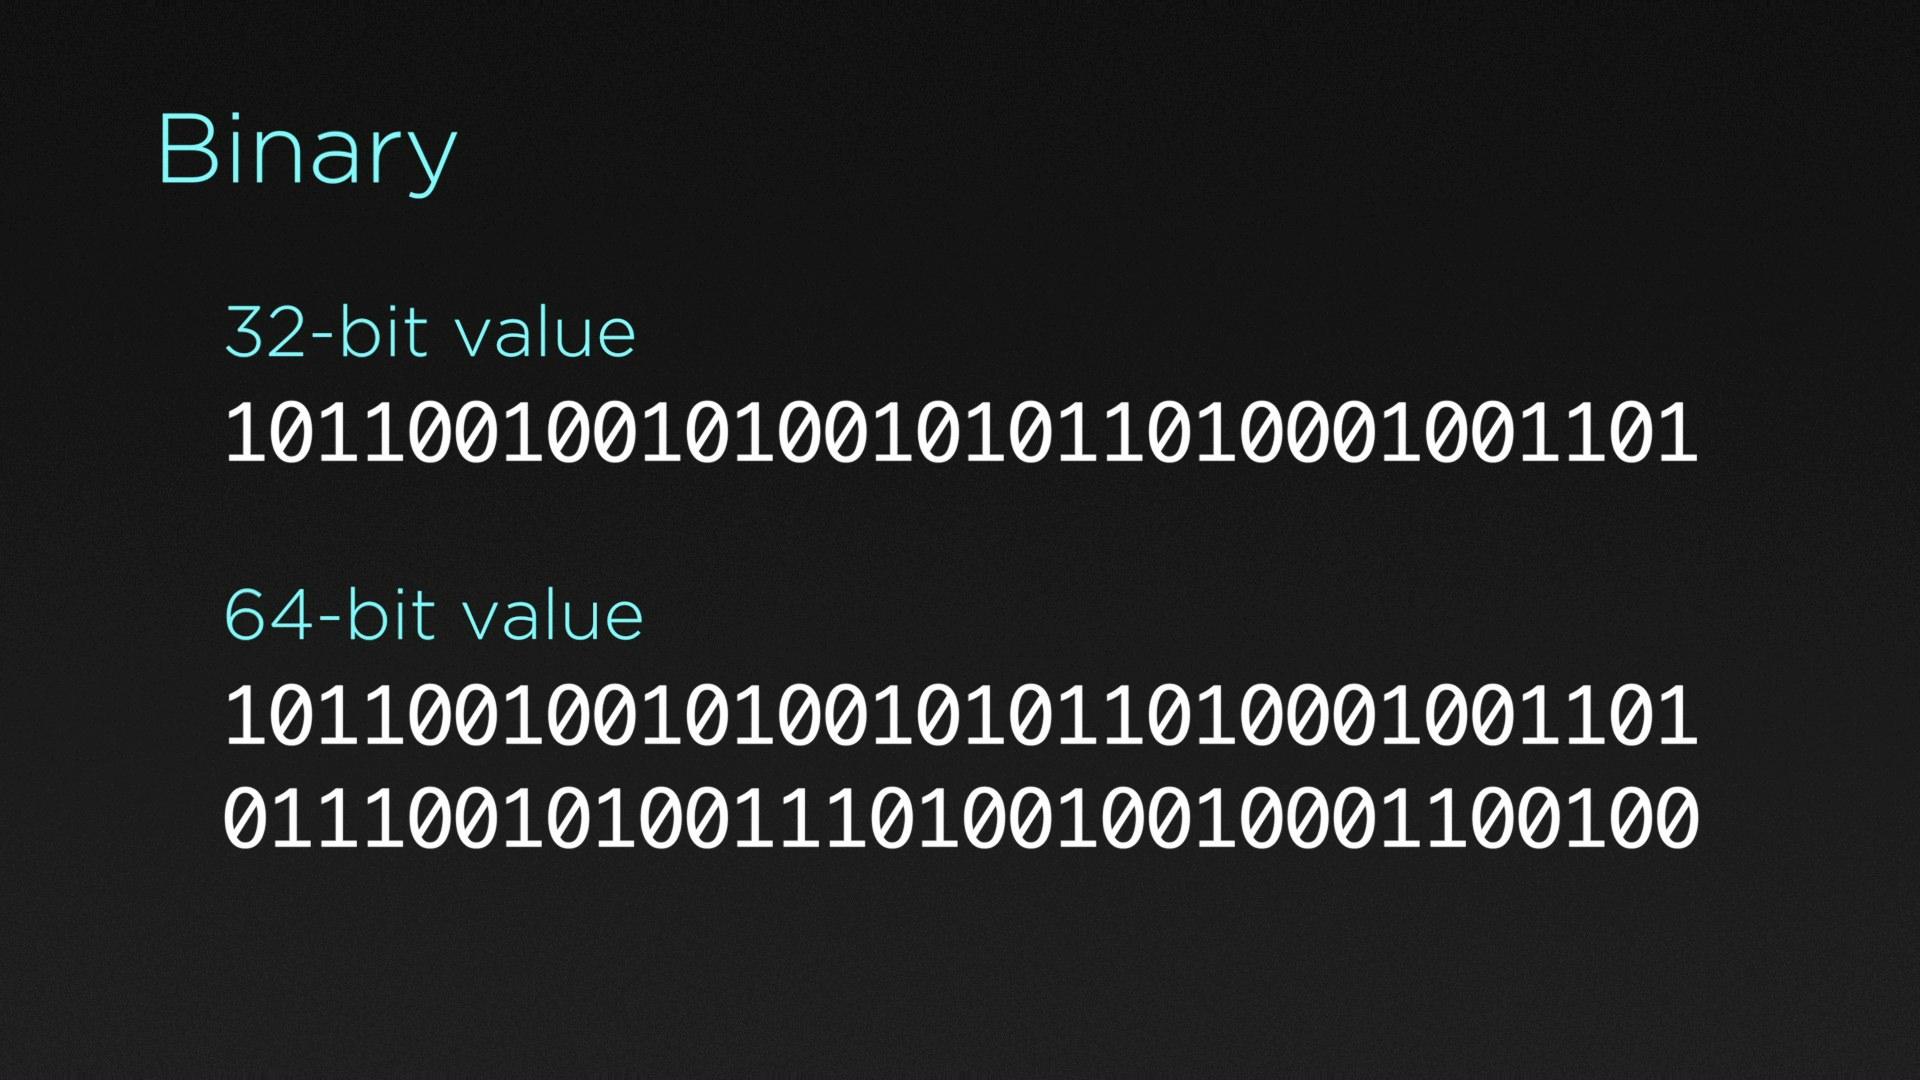 collin_s_lab_Collins_Lab-Binary_and_Hex-v2-20.jpeg